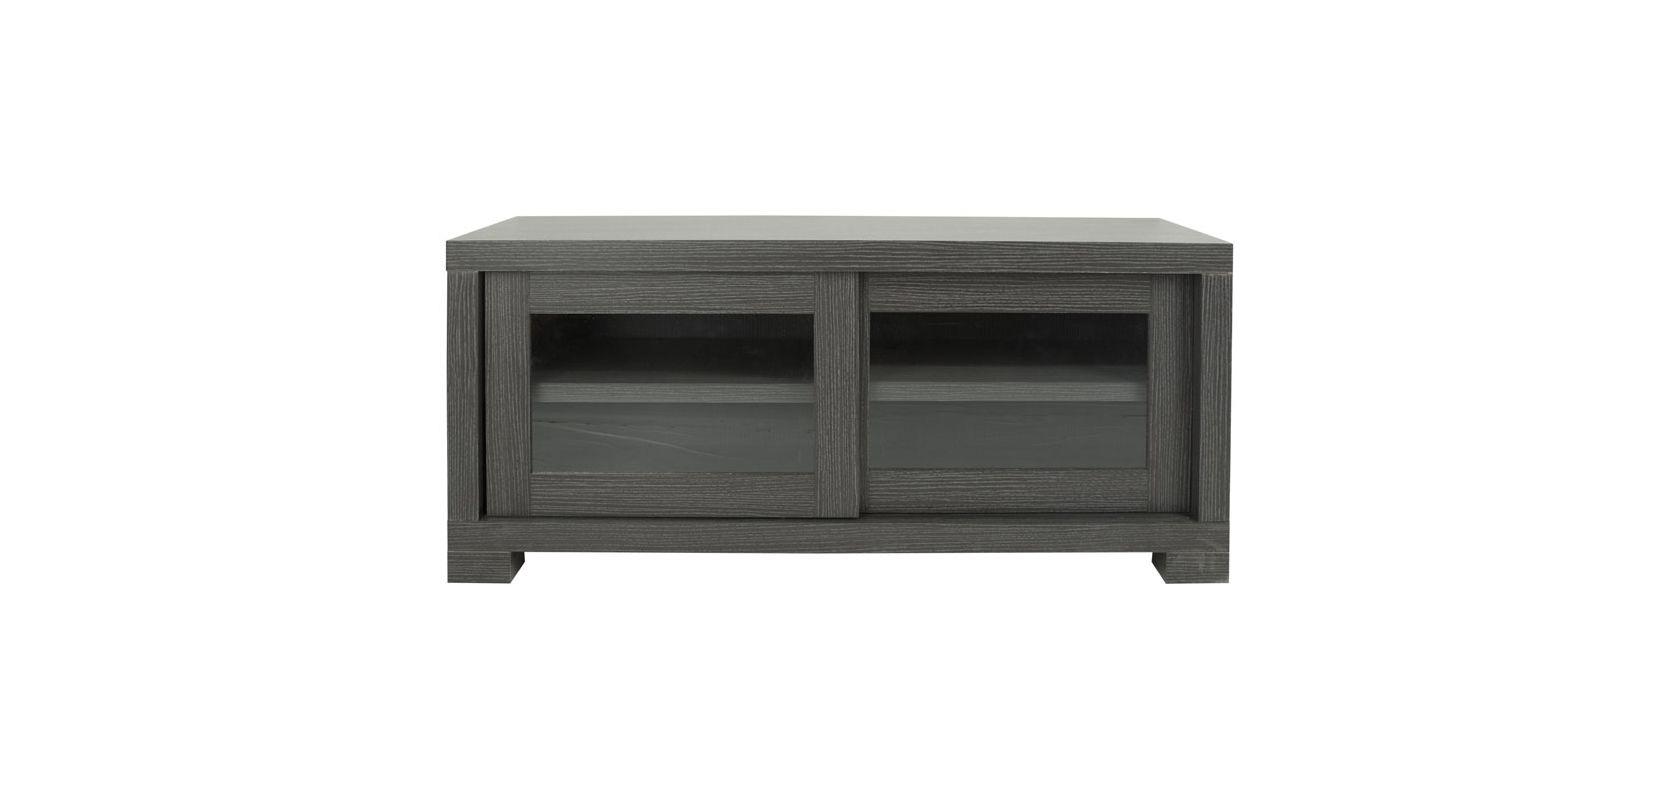 Safavieh SEA1003 Davis Sliding Door TV Cabinet Dark Grey / Charcoal /